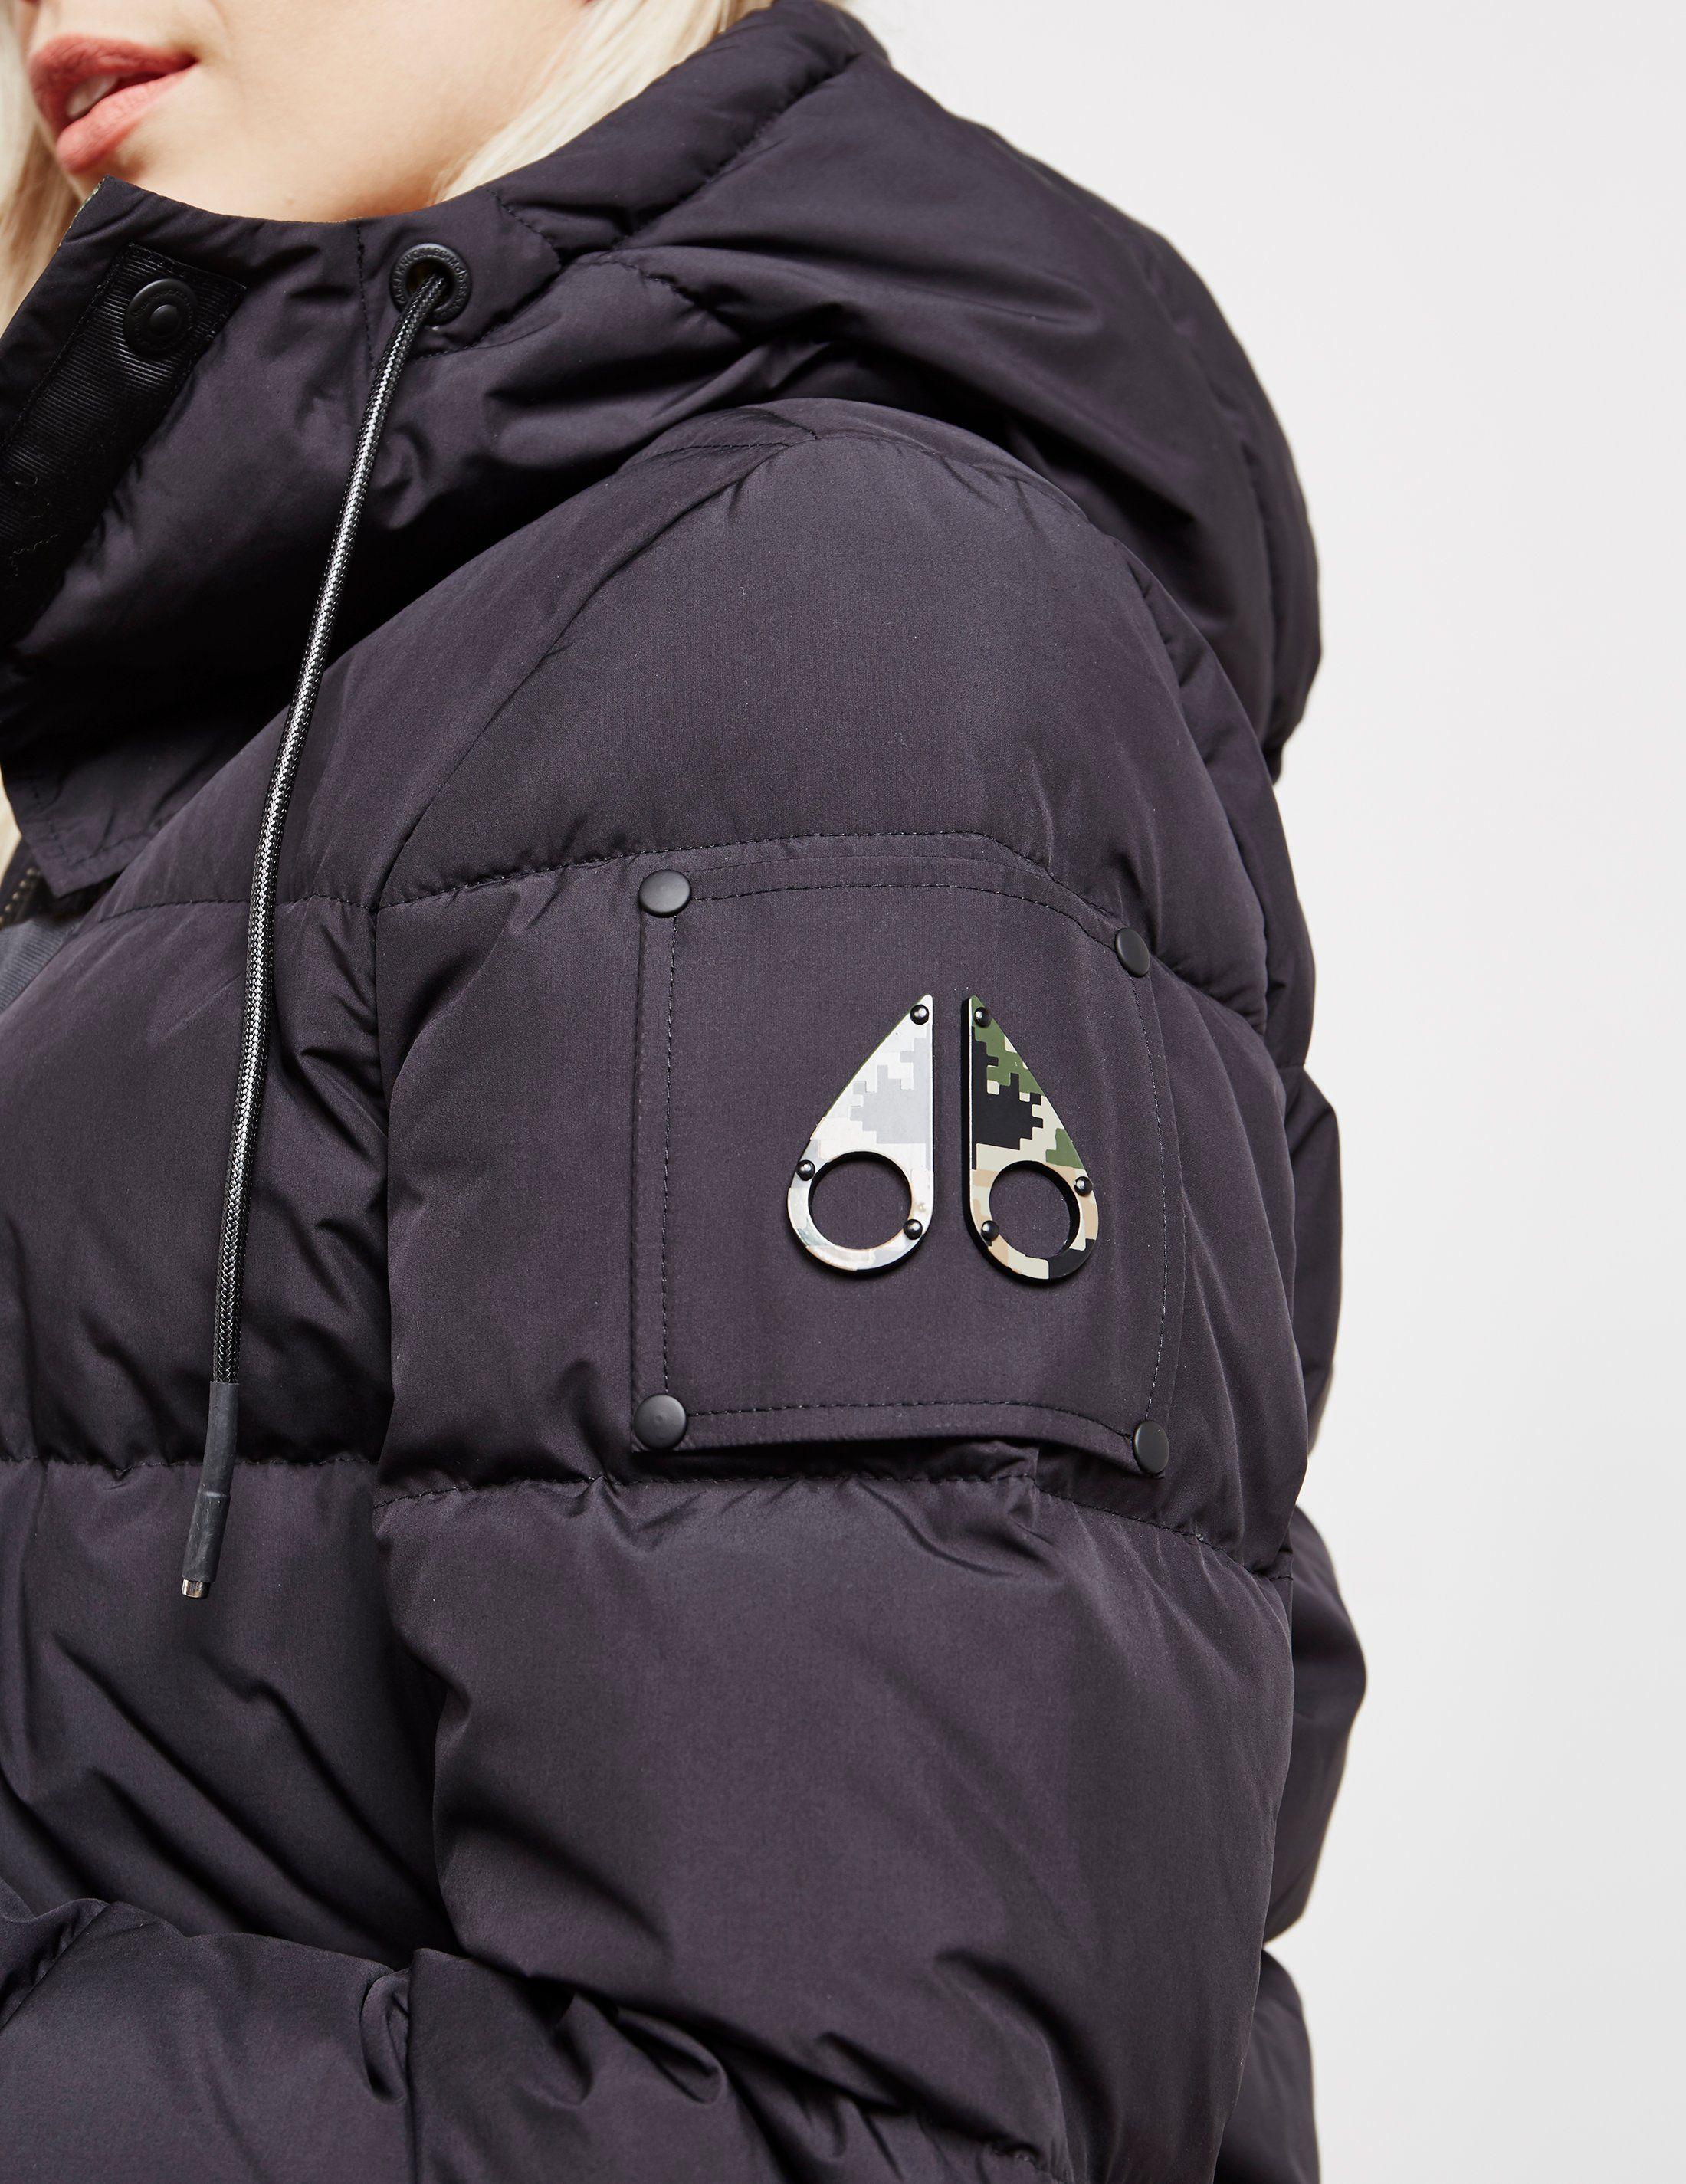 Moose Knuckles Morigeau Bomber Jacket - Online Exclusive